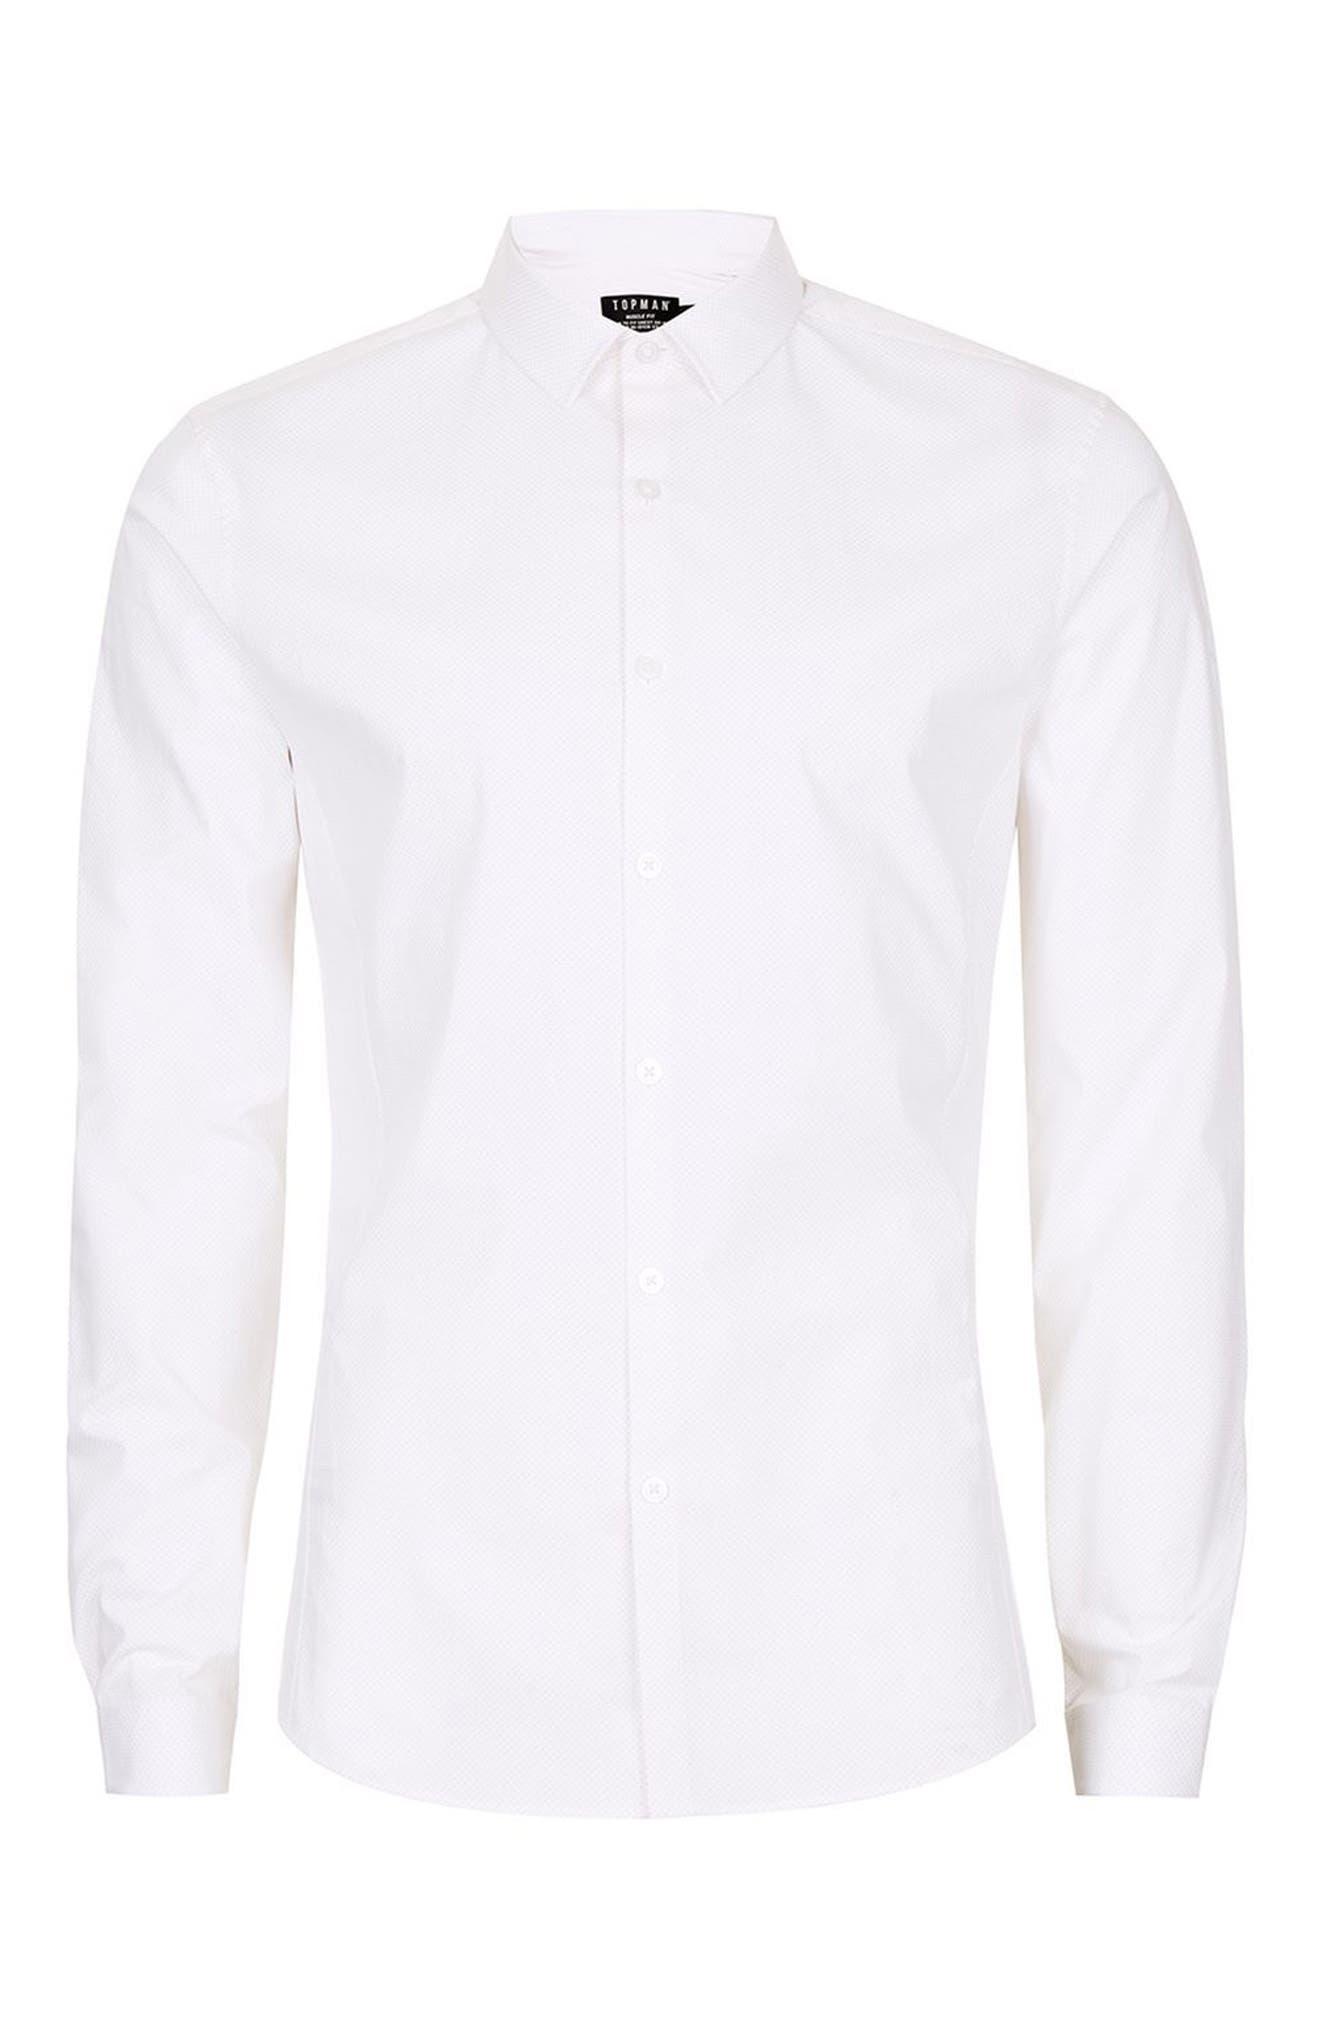 Muscle Fit Polka Dot Shirt,                             Alternate thumbnail 4, color,                             White